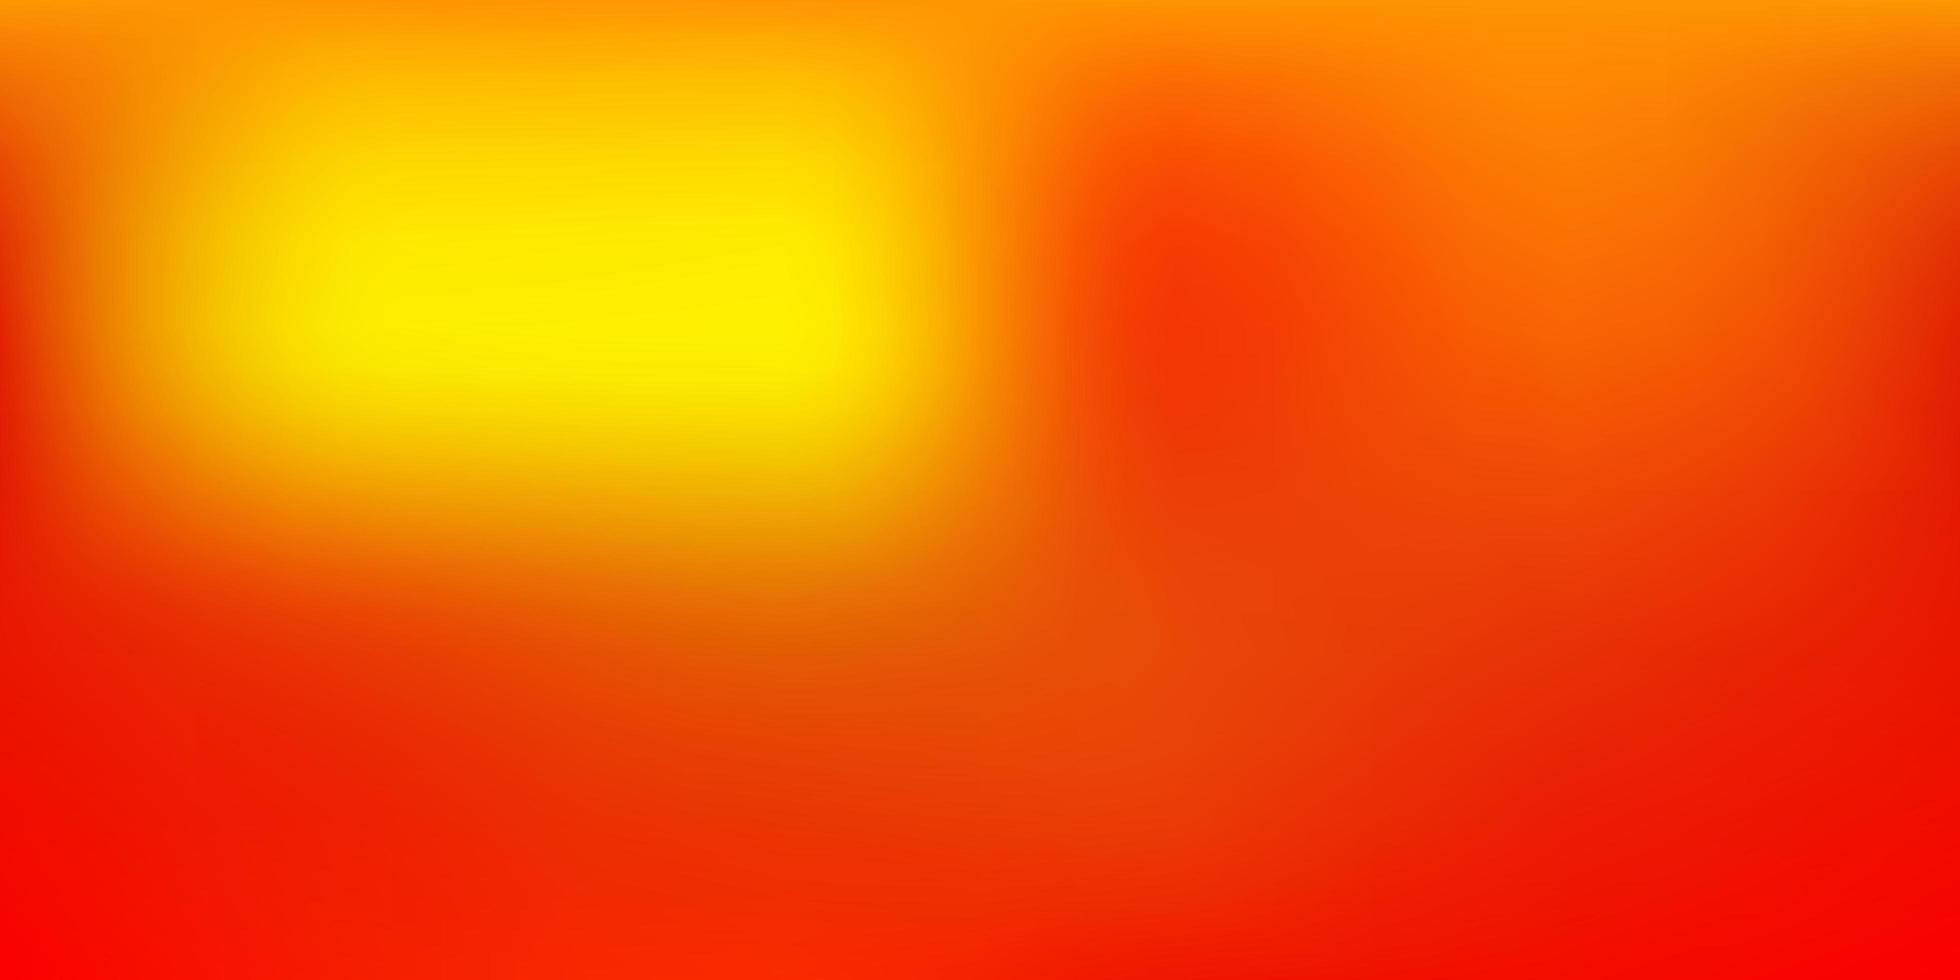 mörk gul vektor suddig bakgrund.